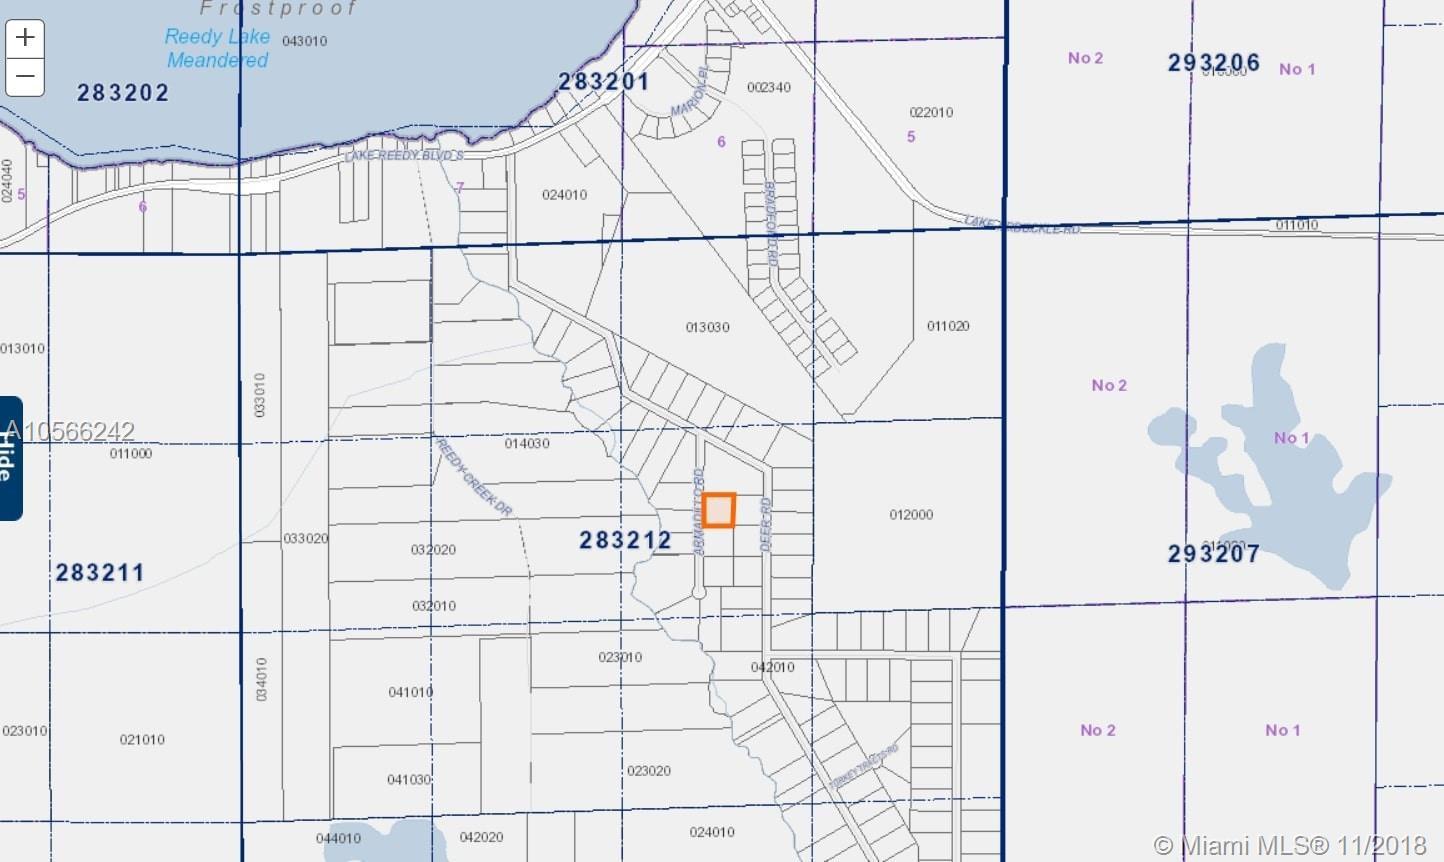 36 Armadillo Rd, Frostproof, Fl 33843 - Lot/land - Mls #a10566242 - Frostproof Florida Map